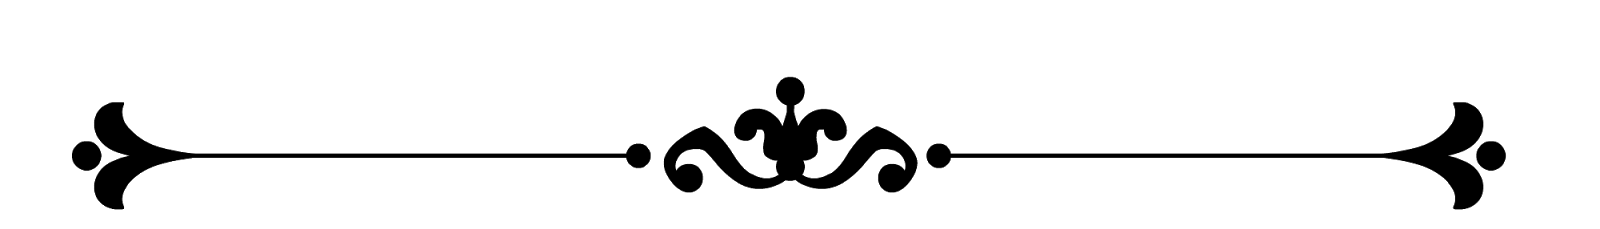 transparent-scroll-line